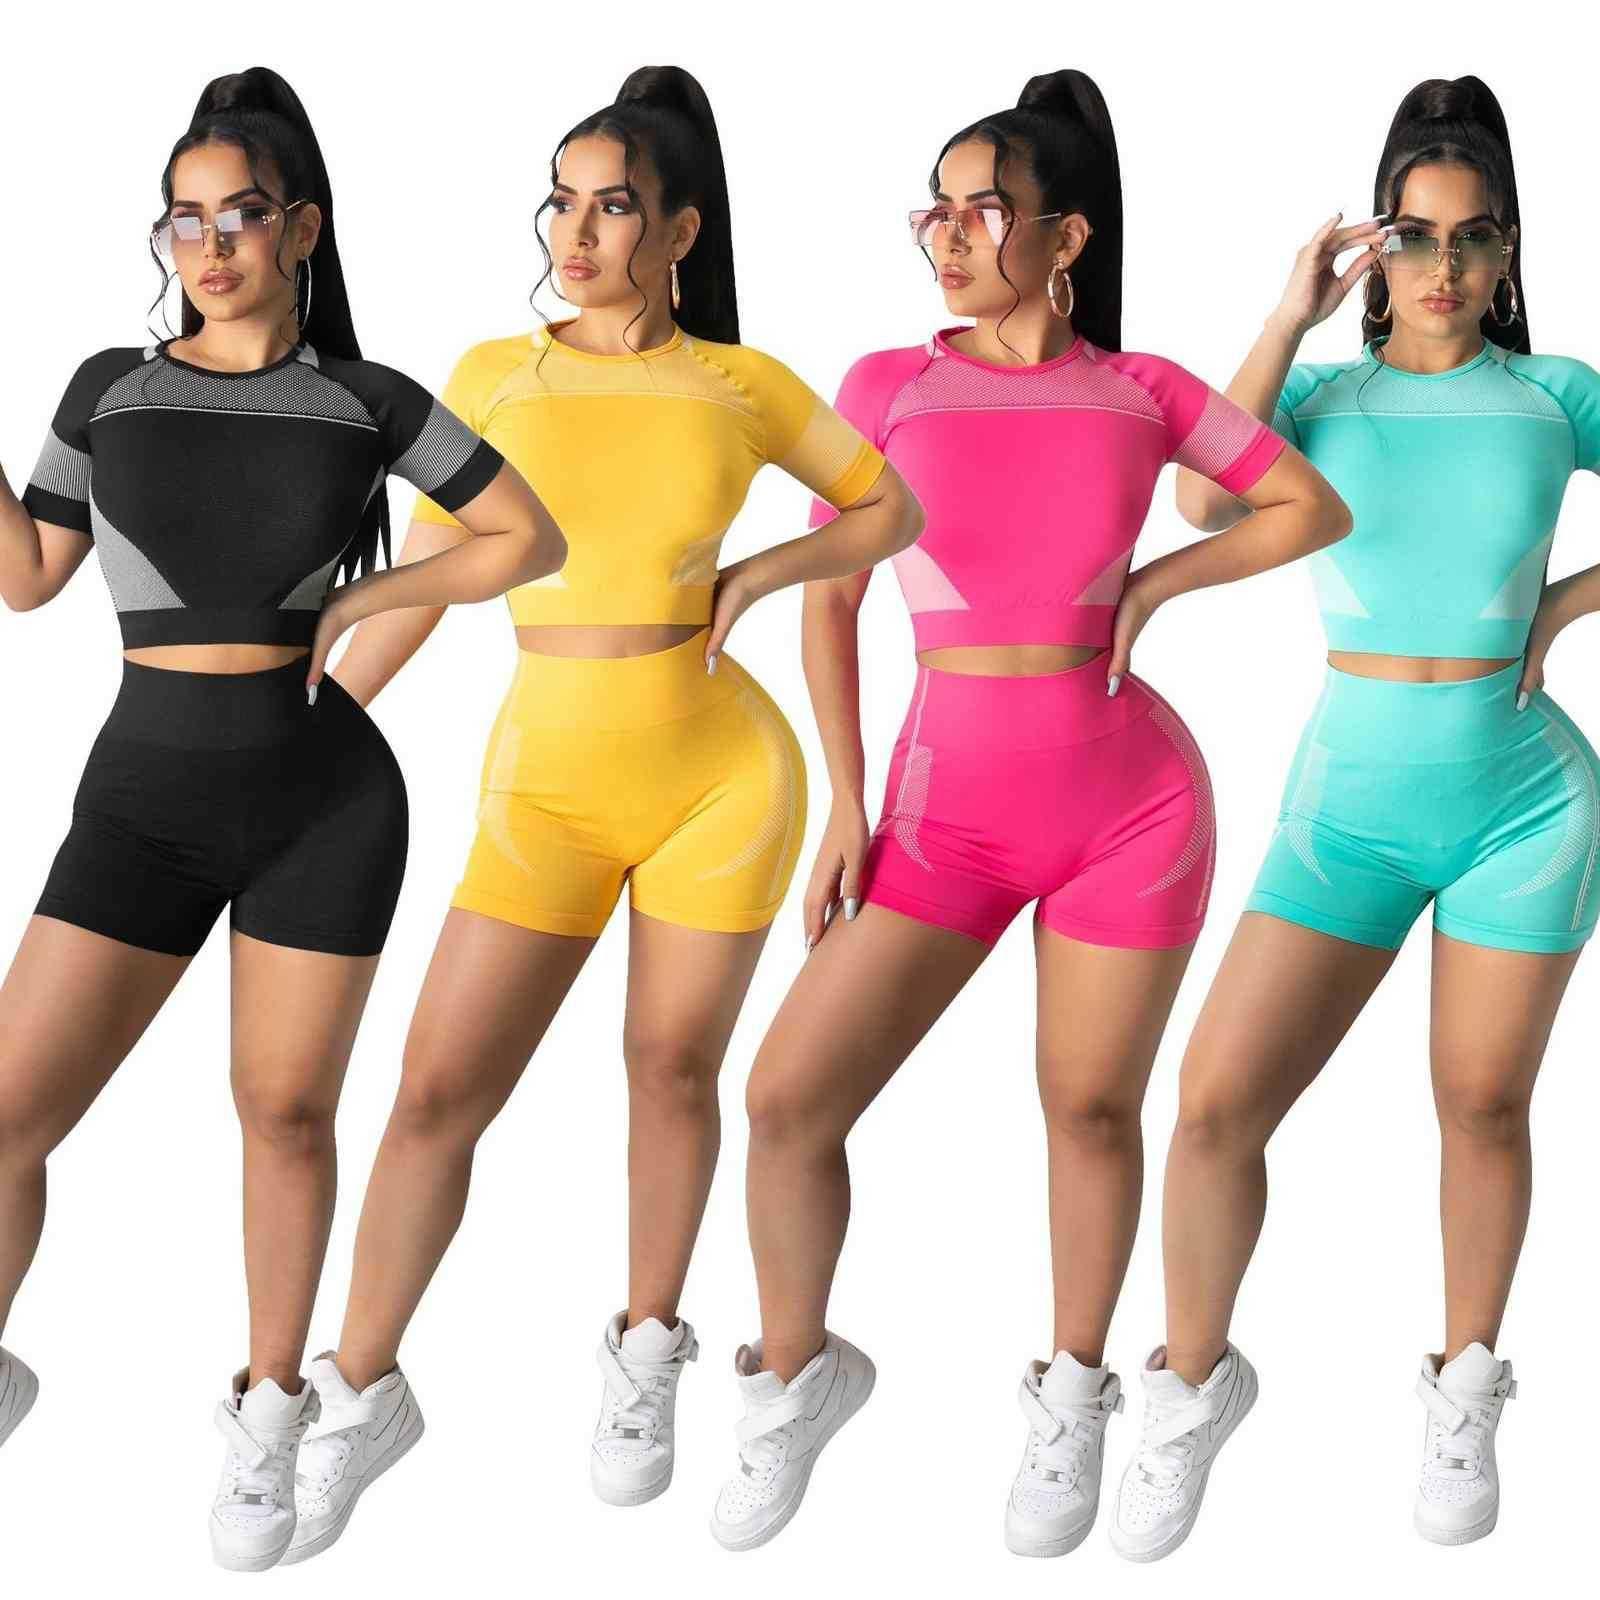 Designer News Summer Women Sportwear Outfits Fashion Casual Printed T Shirt Shorts 2 Piece Set Tracksuits Sportswear Ladies Jogging Suit S-XL